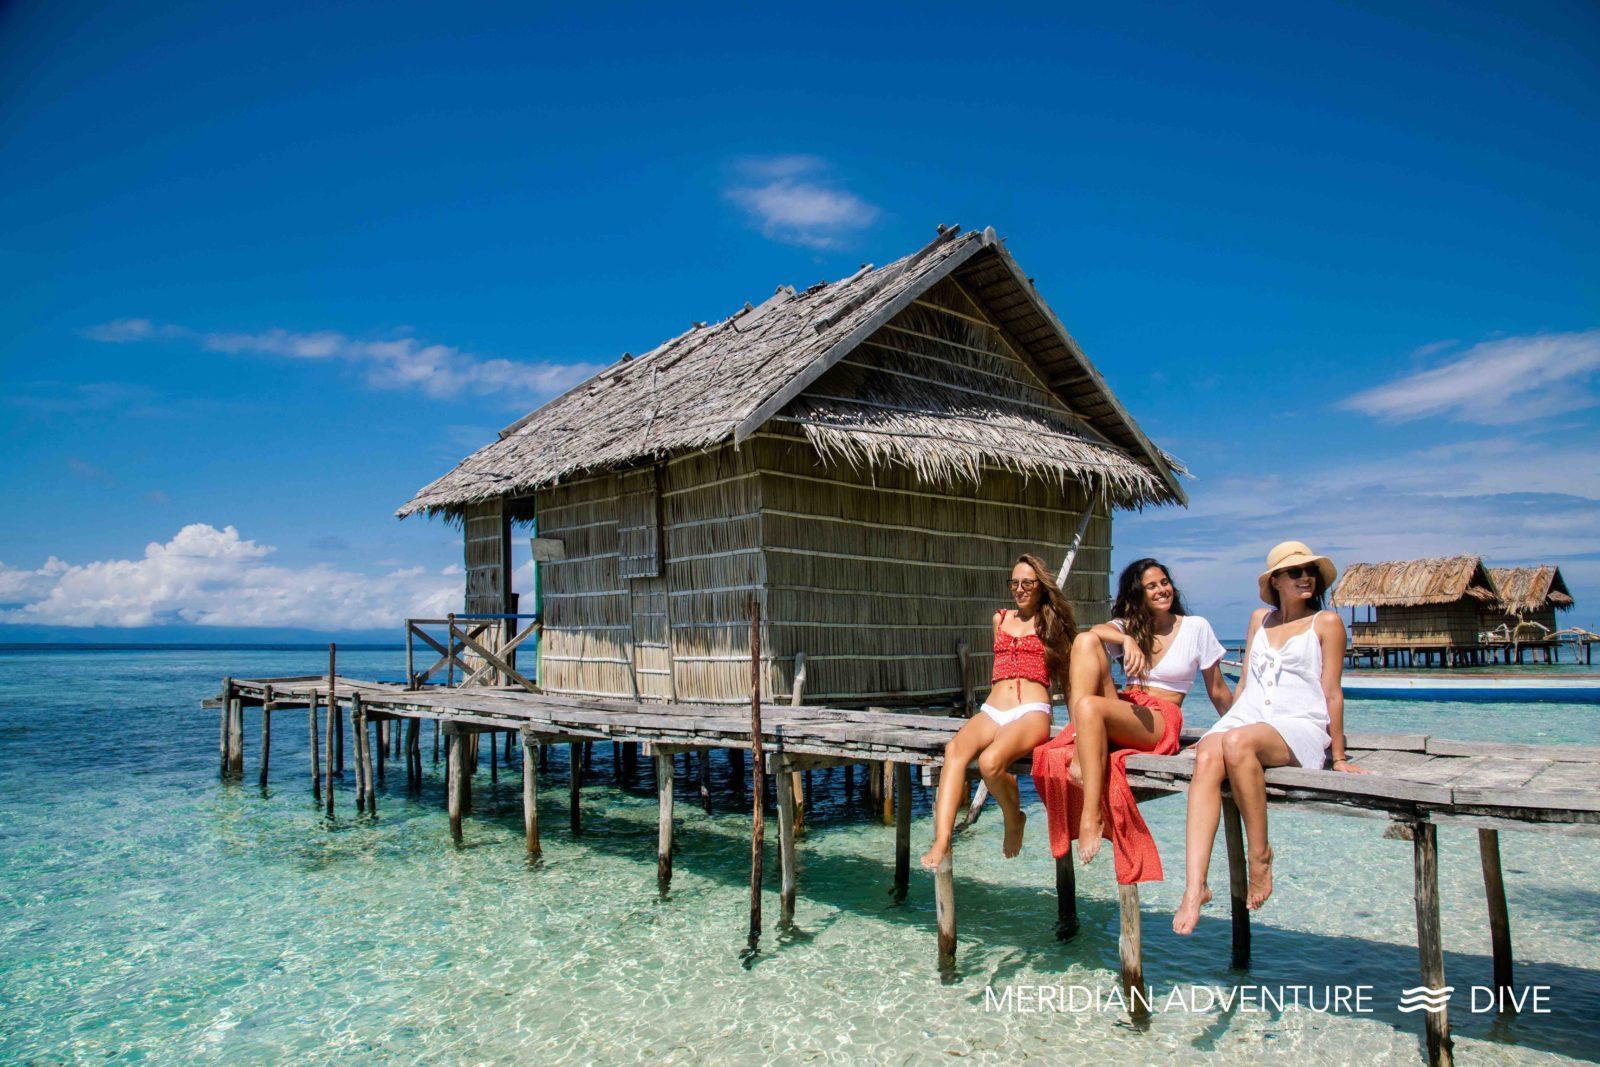 Discover Amazing Raja Ampat with Meridian Adventure Dive.